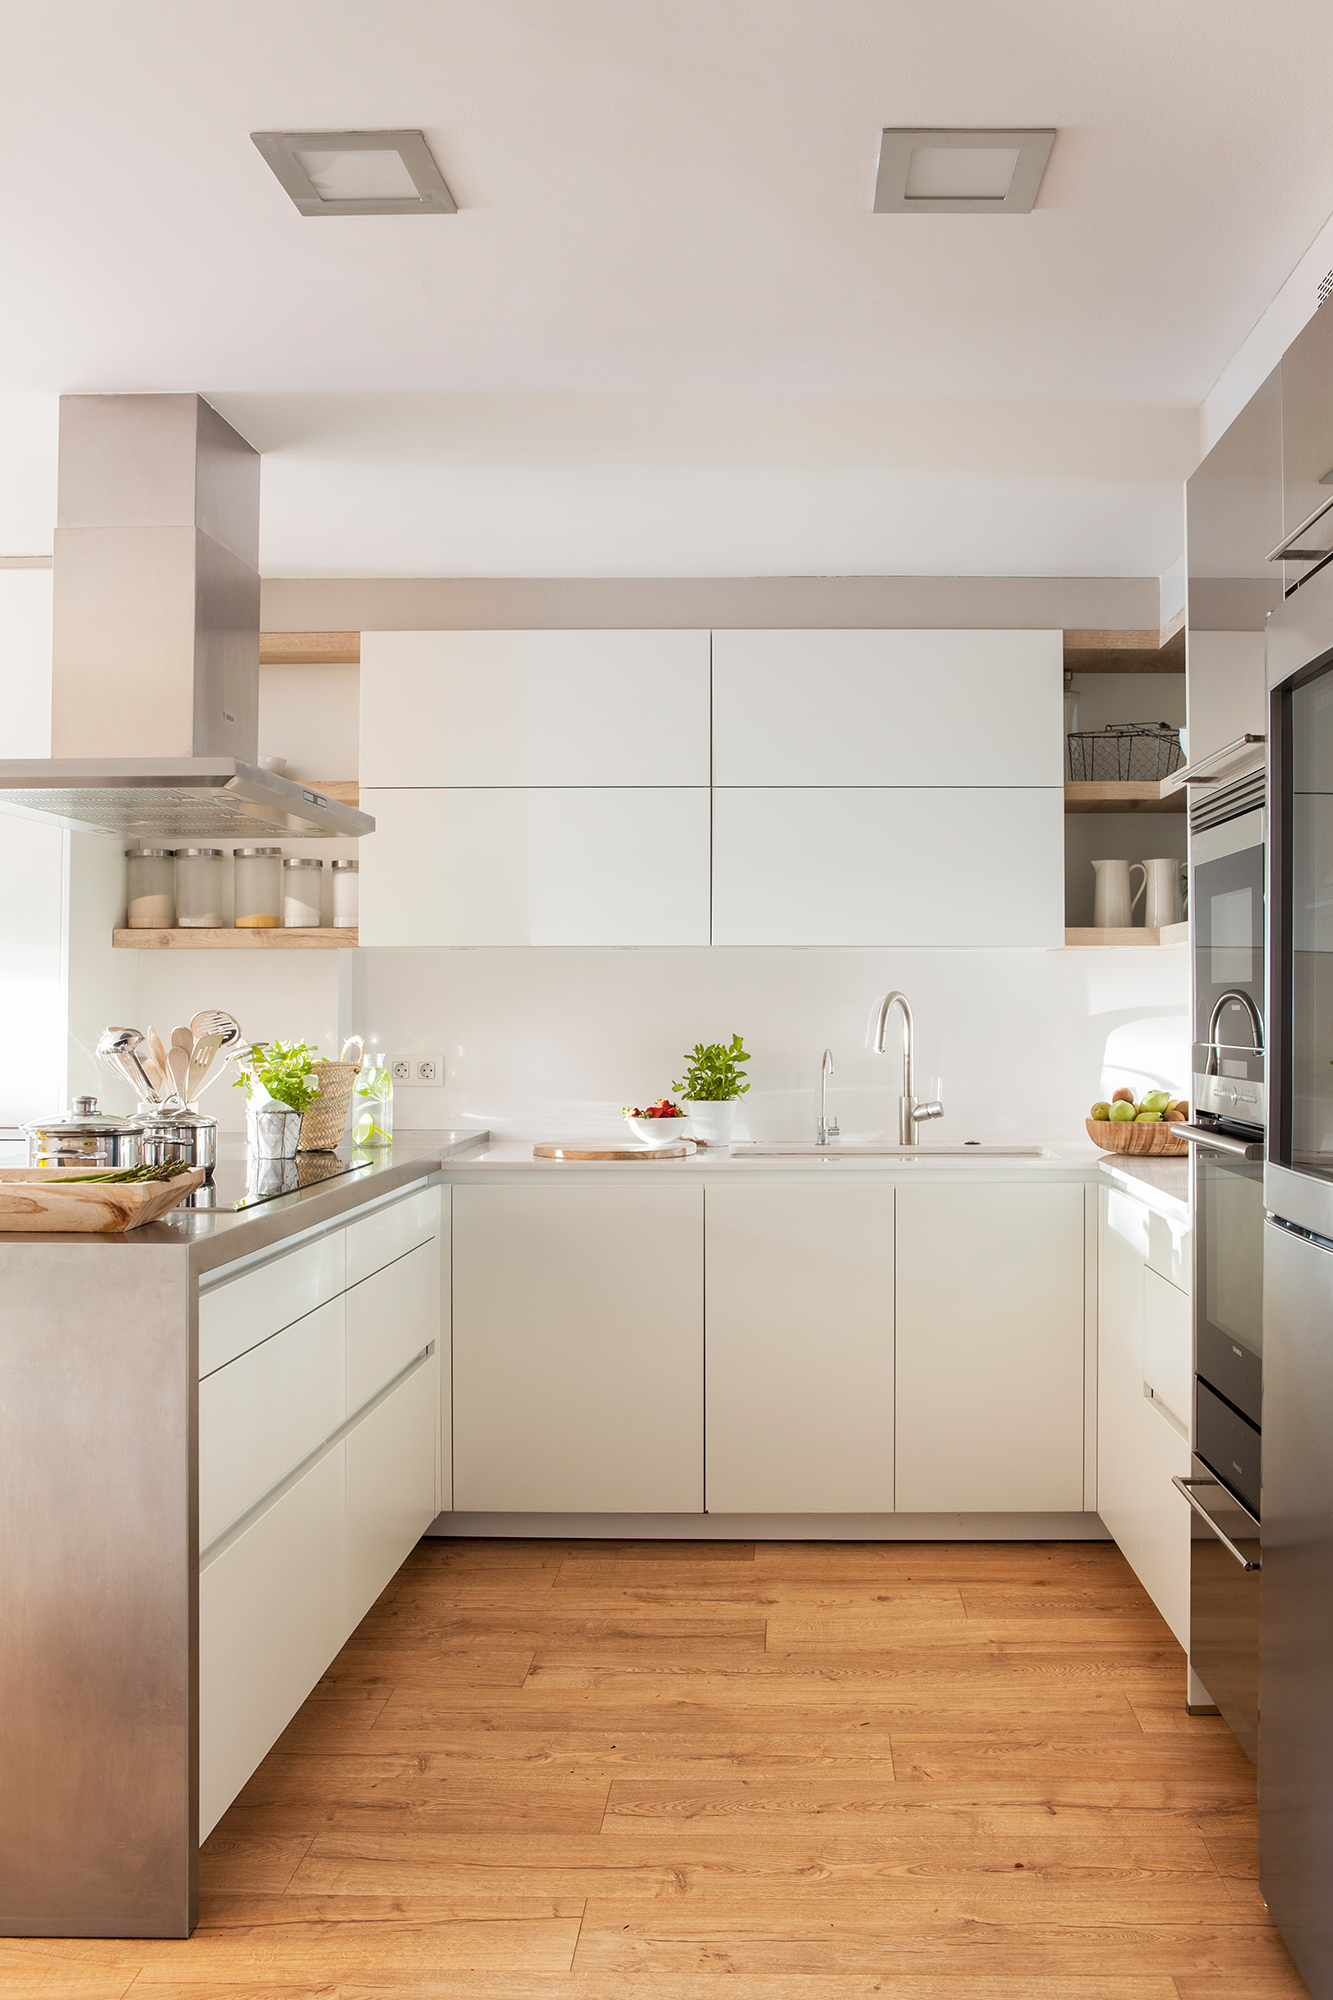 C mo iluminar la cocina 20 claves - Iluminacion para cocina comedor ...